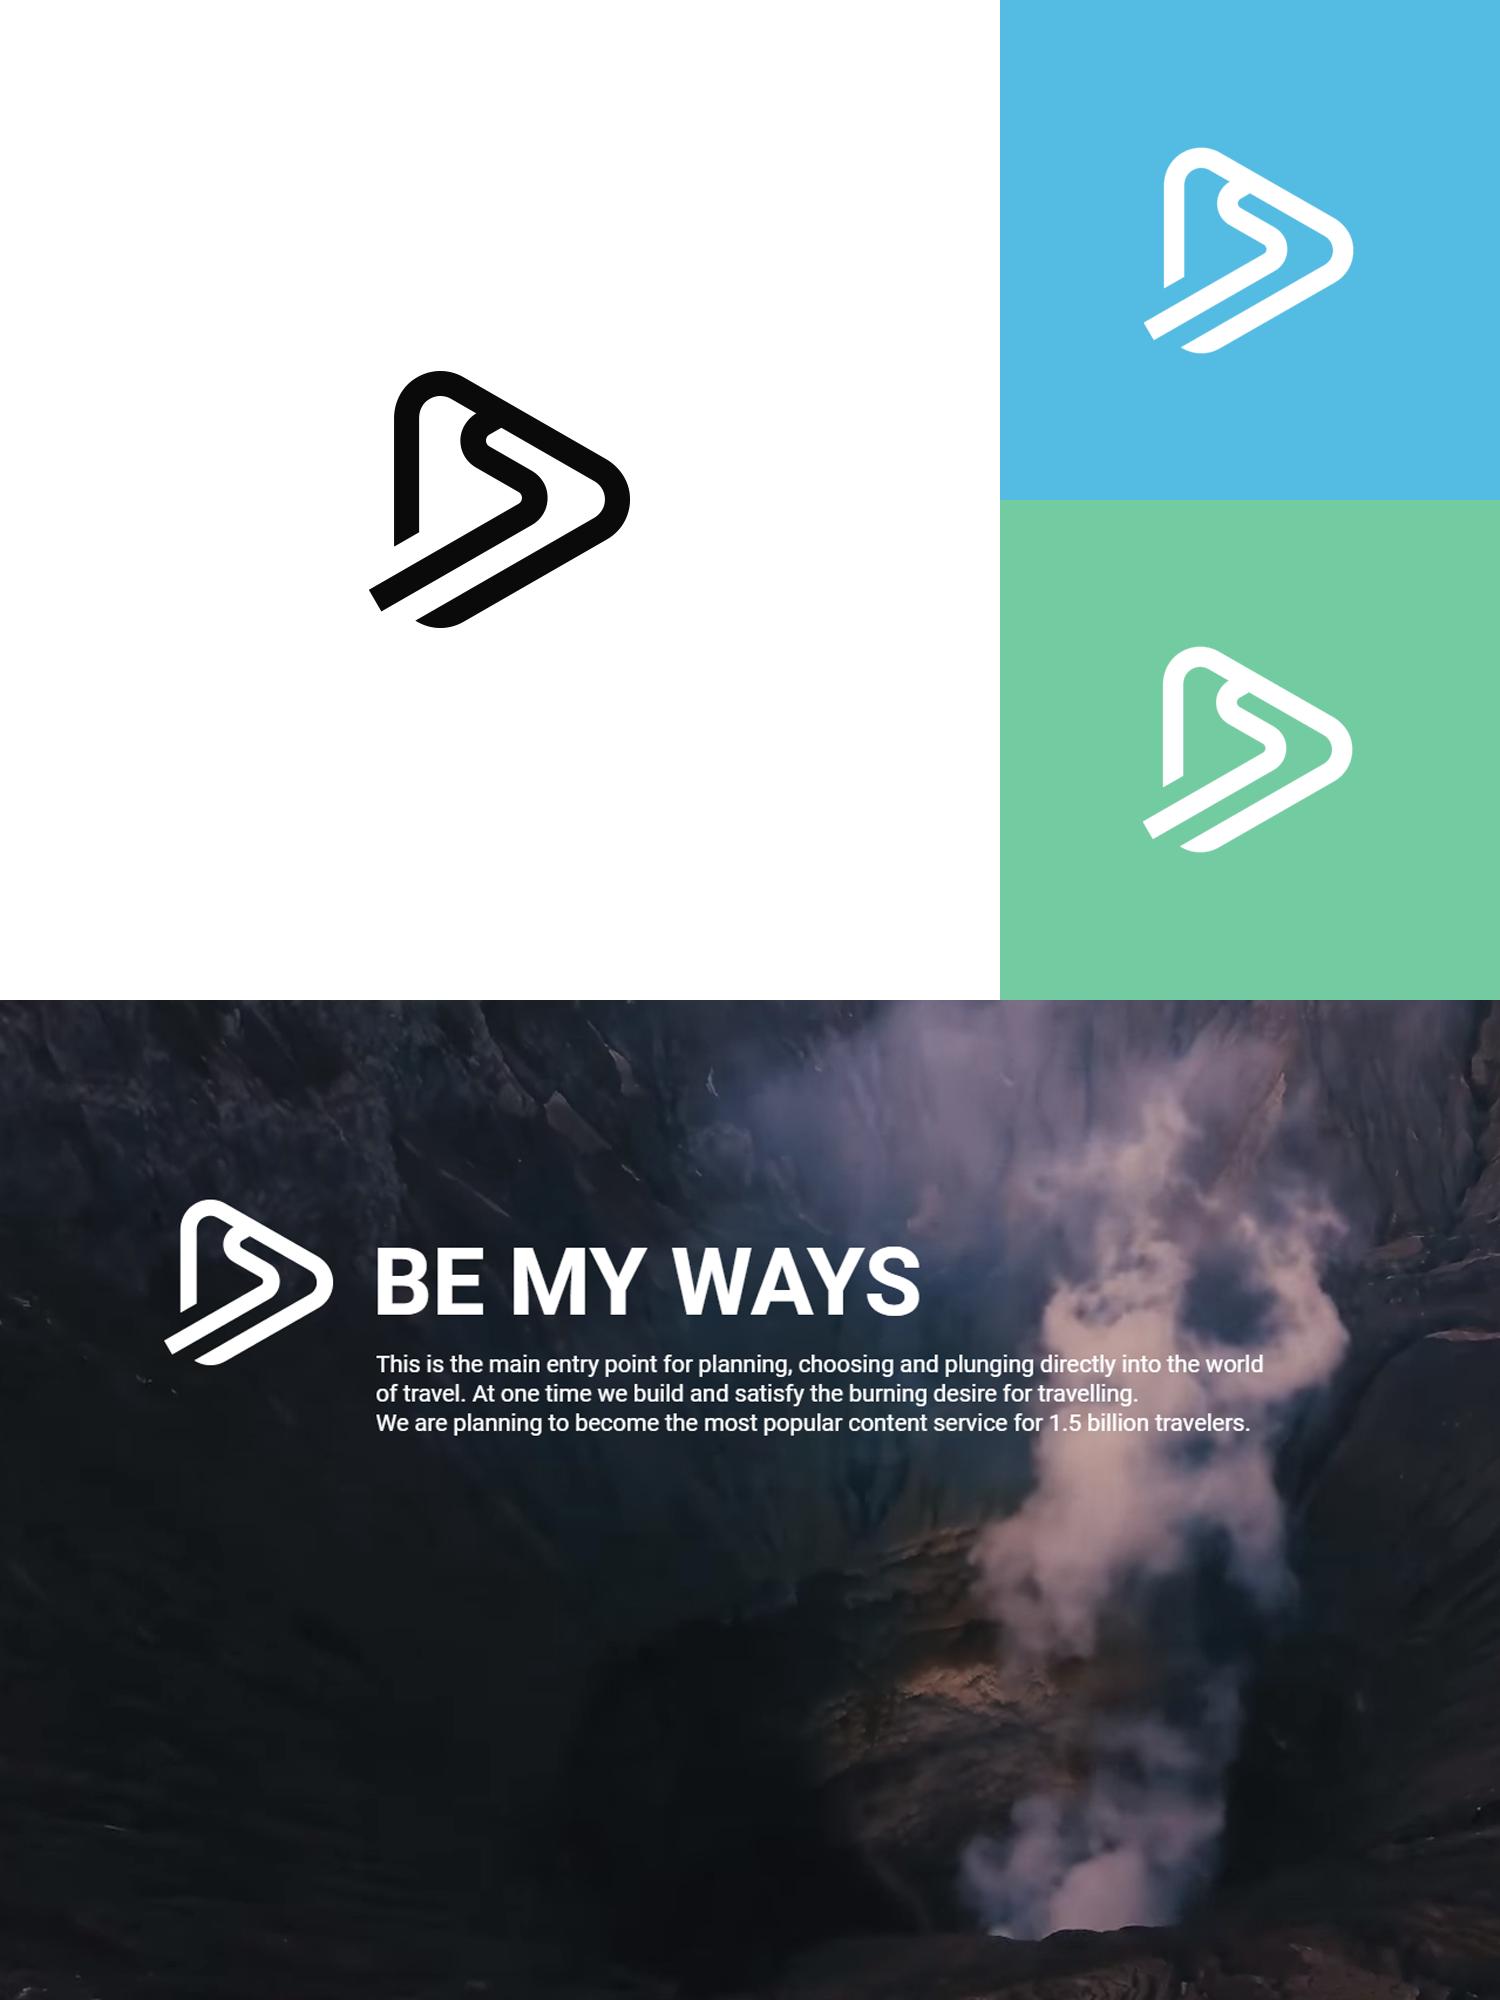 Разработка логотипа и иконки для Travel Video Platform фото f_2085c3b639ede3dd.png